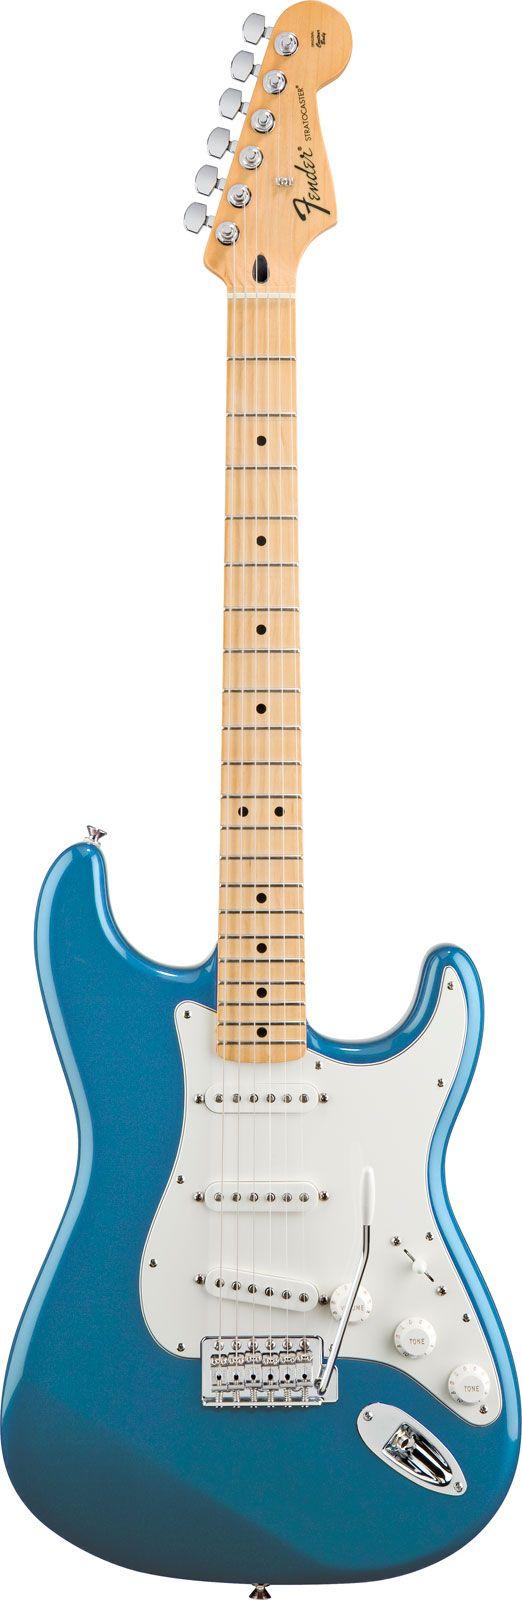 Fender Standard Stratocaster HSS Lake Placid Blue Maple   Teal green ...